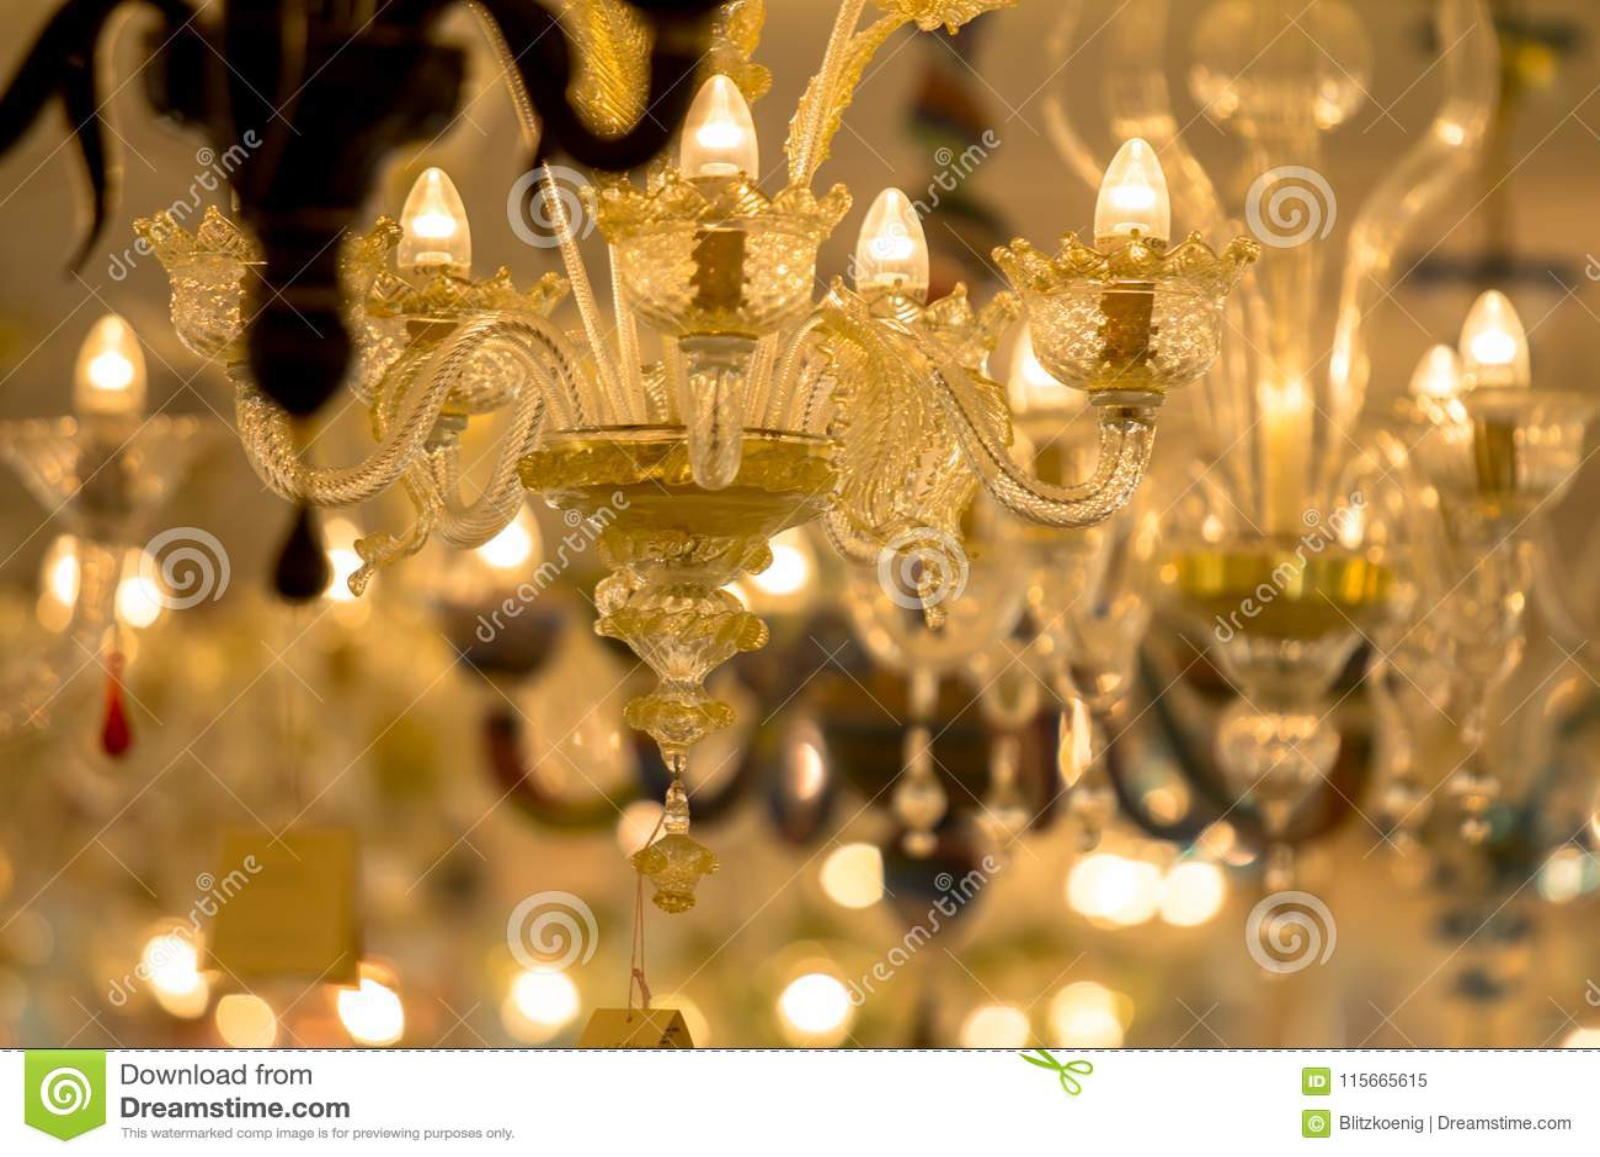 Beroemd Murano-glas in Venetië